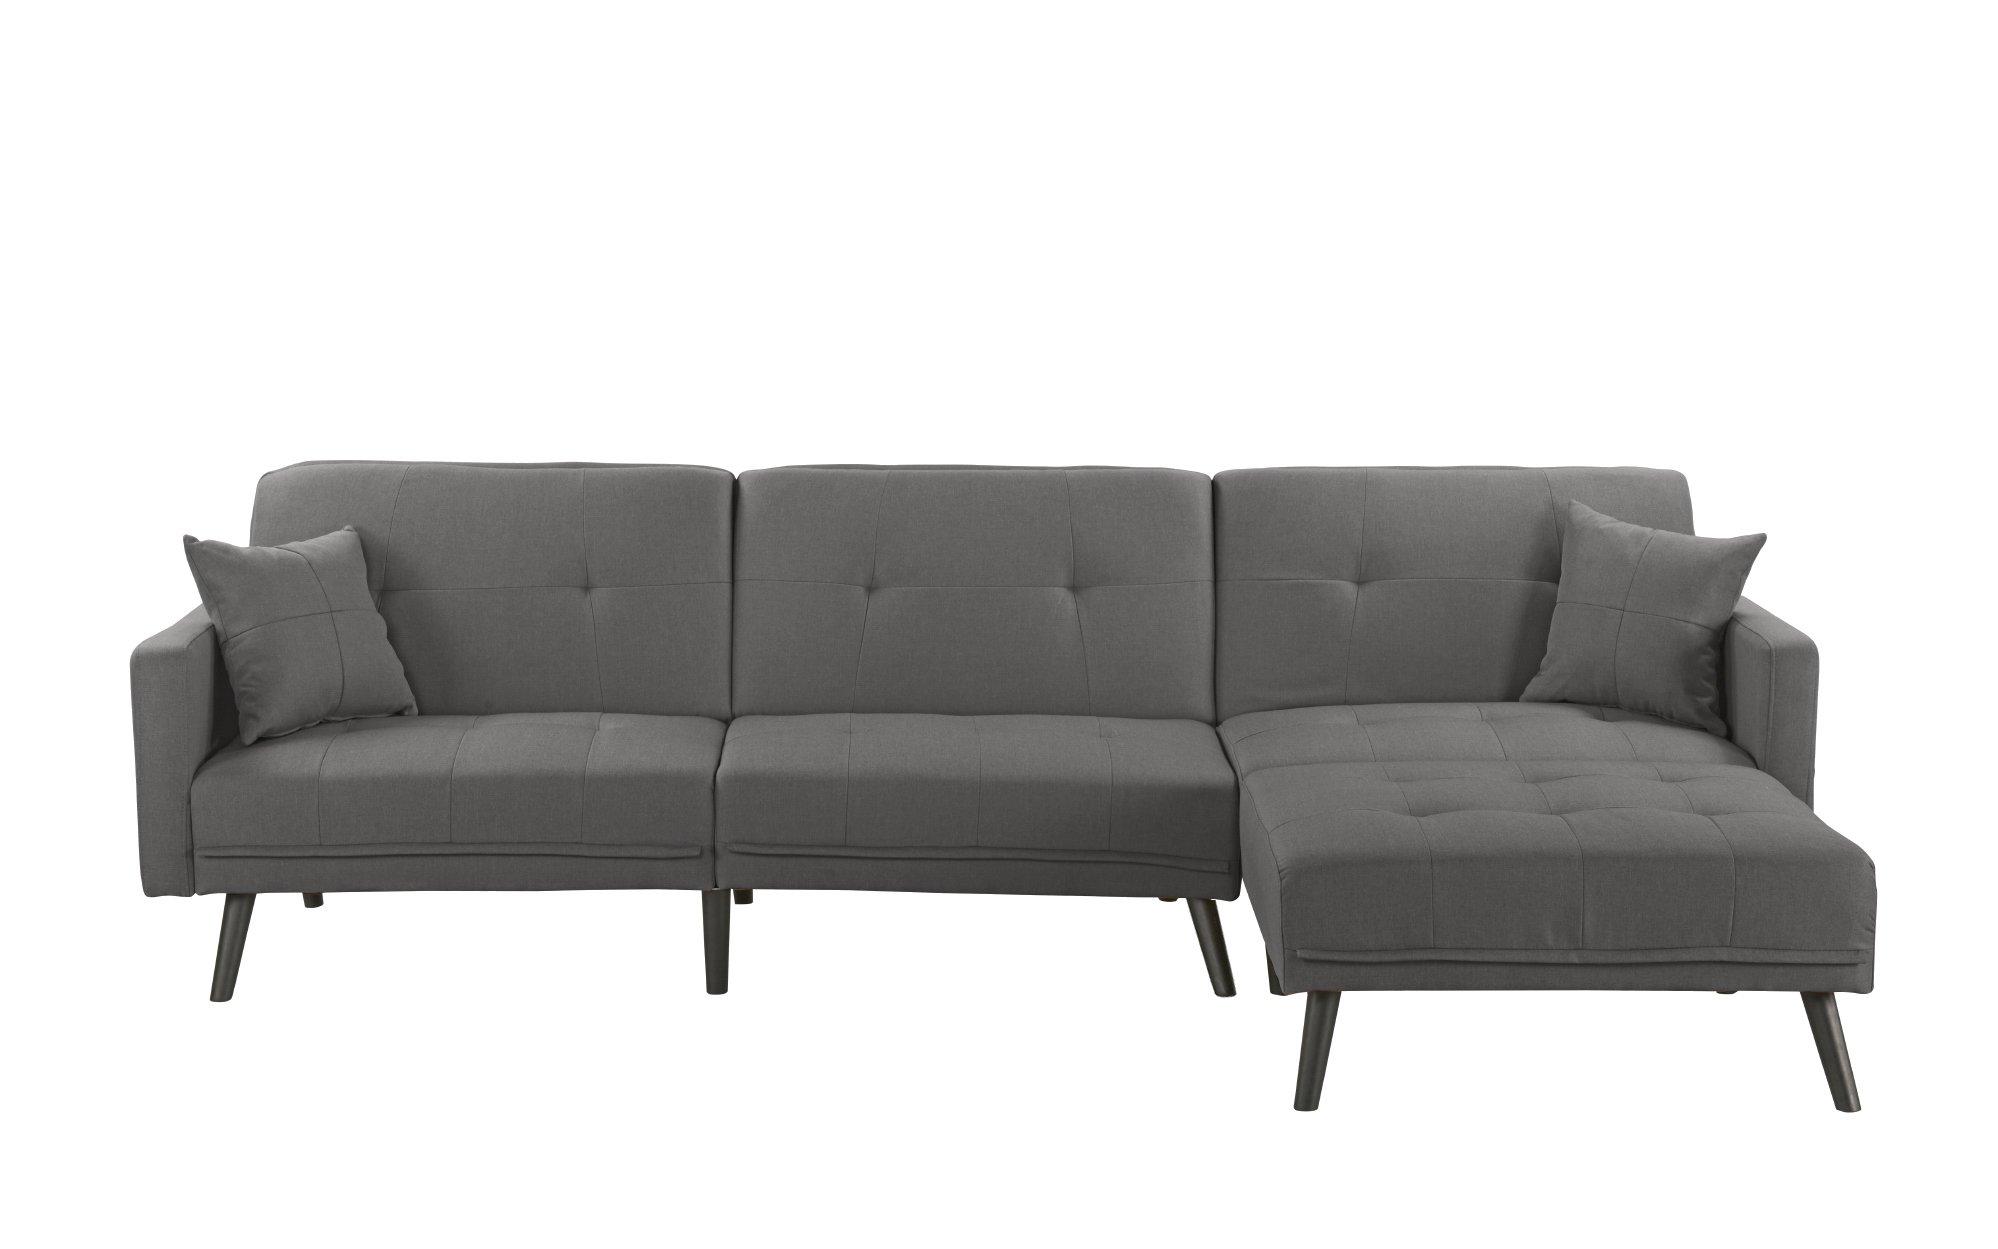 Details about Mid Century Modern Reversible Sofa Sleeper Futon Sofa, L  Shape Couch, Dark Grey